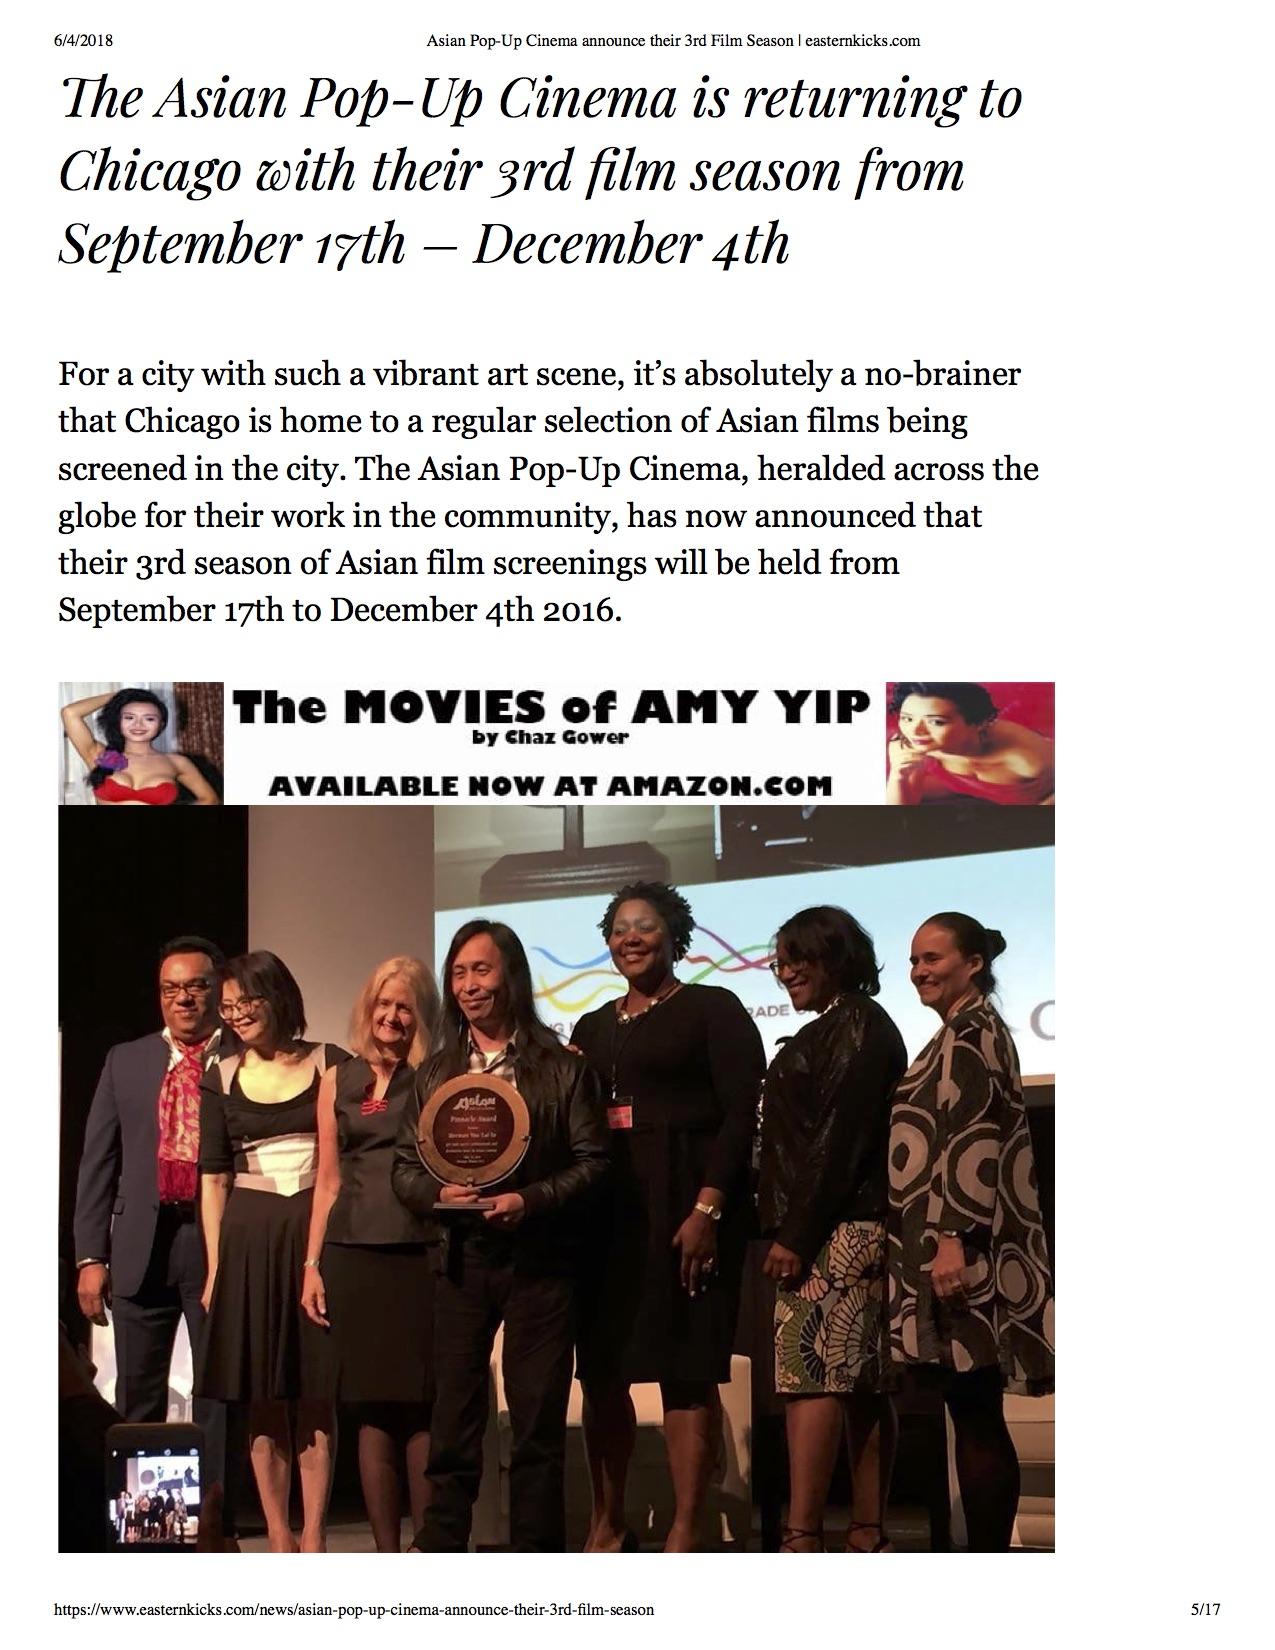 5Asian Pop-Up Cinema announce their 3rd Film Season _ easternkicks.jpg